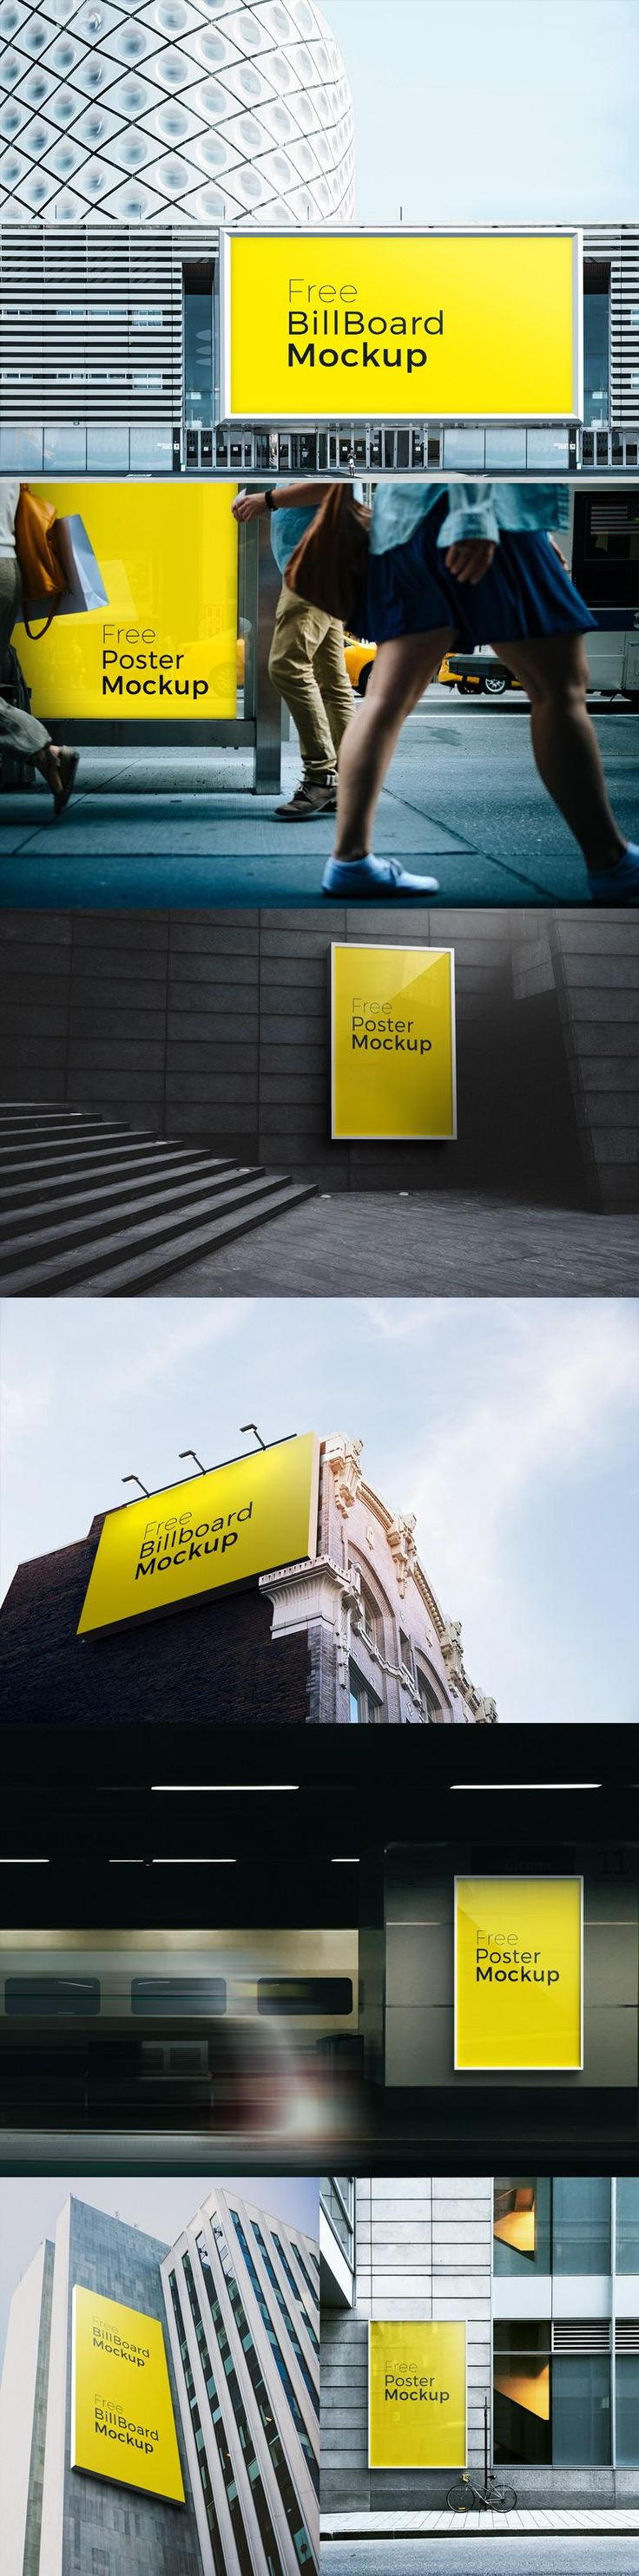 7 Free Billboard Mockups